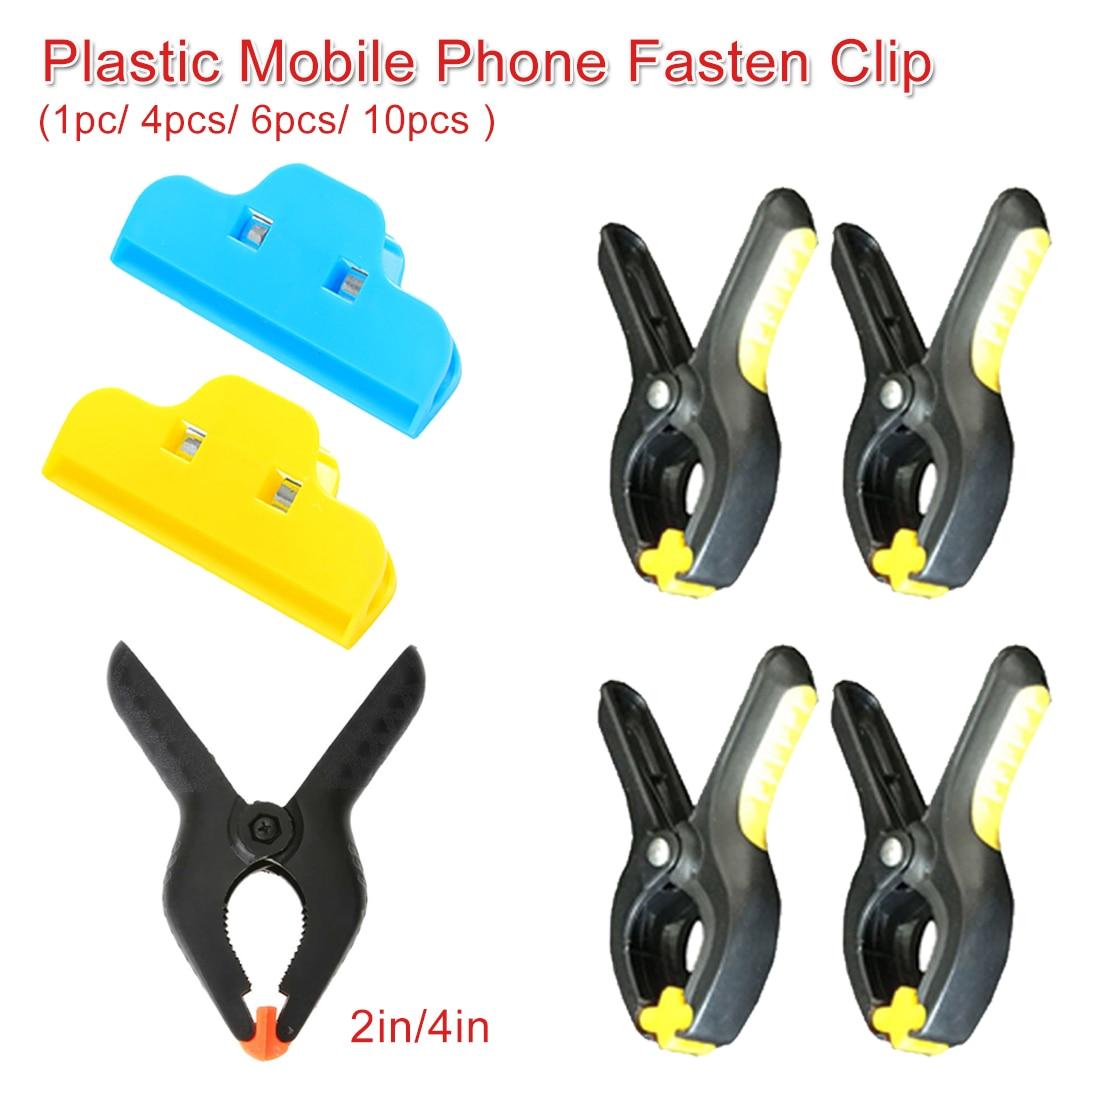 Plastic Clip Fixture Holding Repair Tool 4pcs/6pcs/10pcs Phone Screen Fastening Clamp For IPhone Repair Mobile Phone Fasten Clip